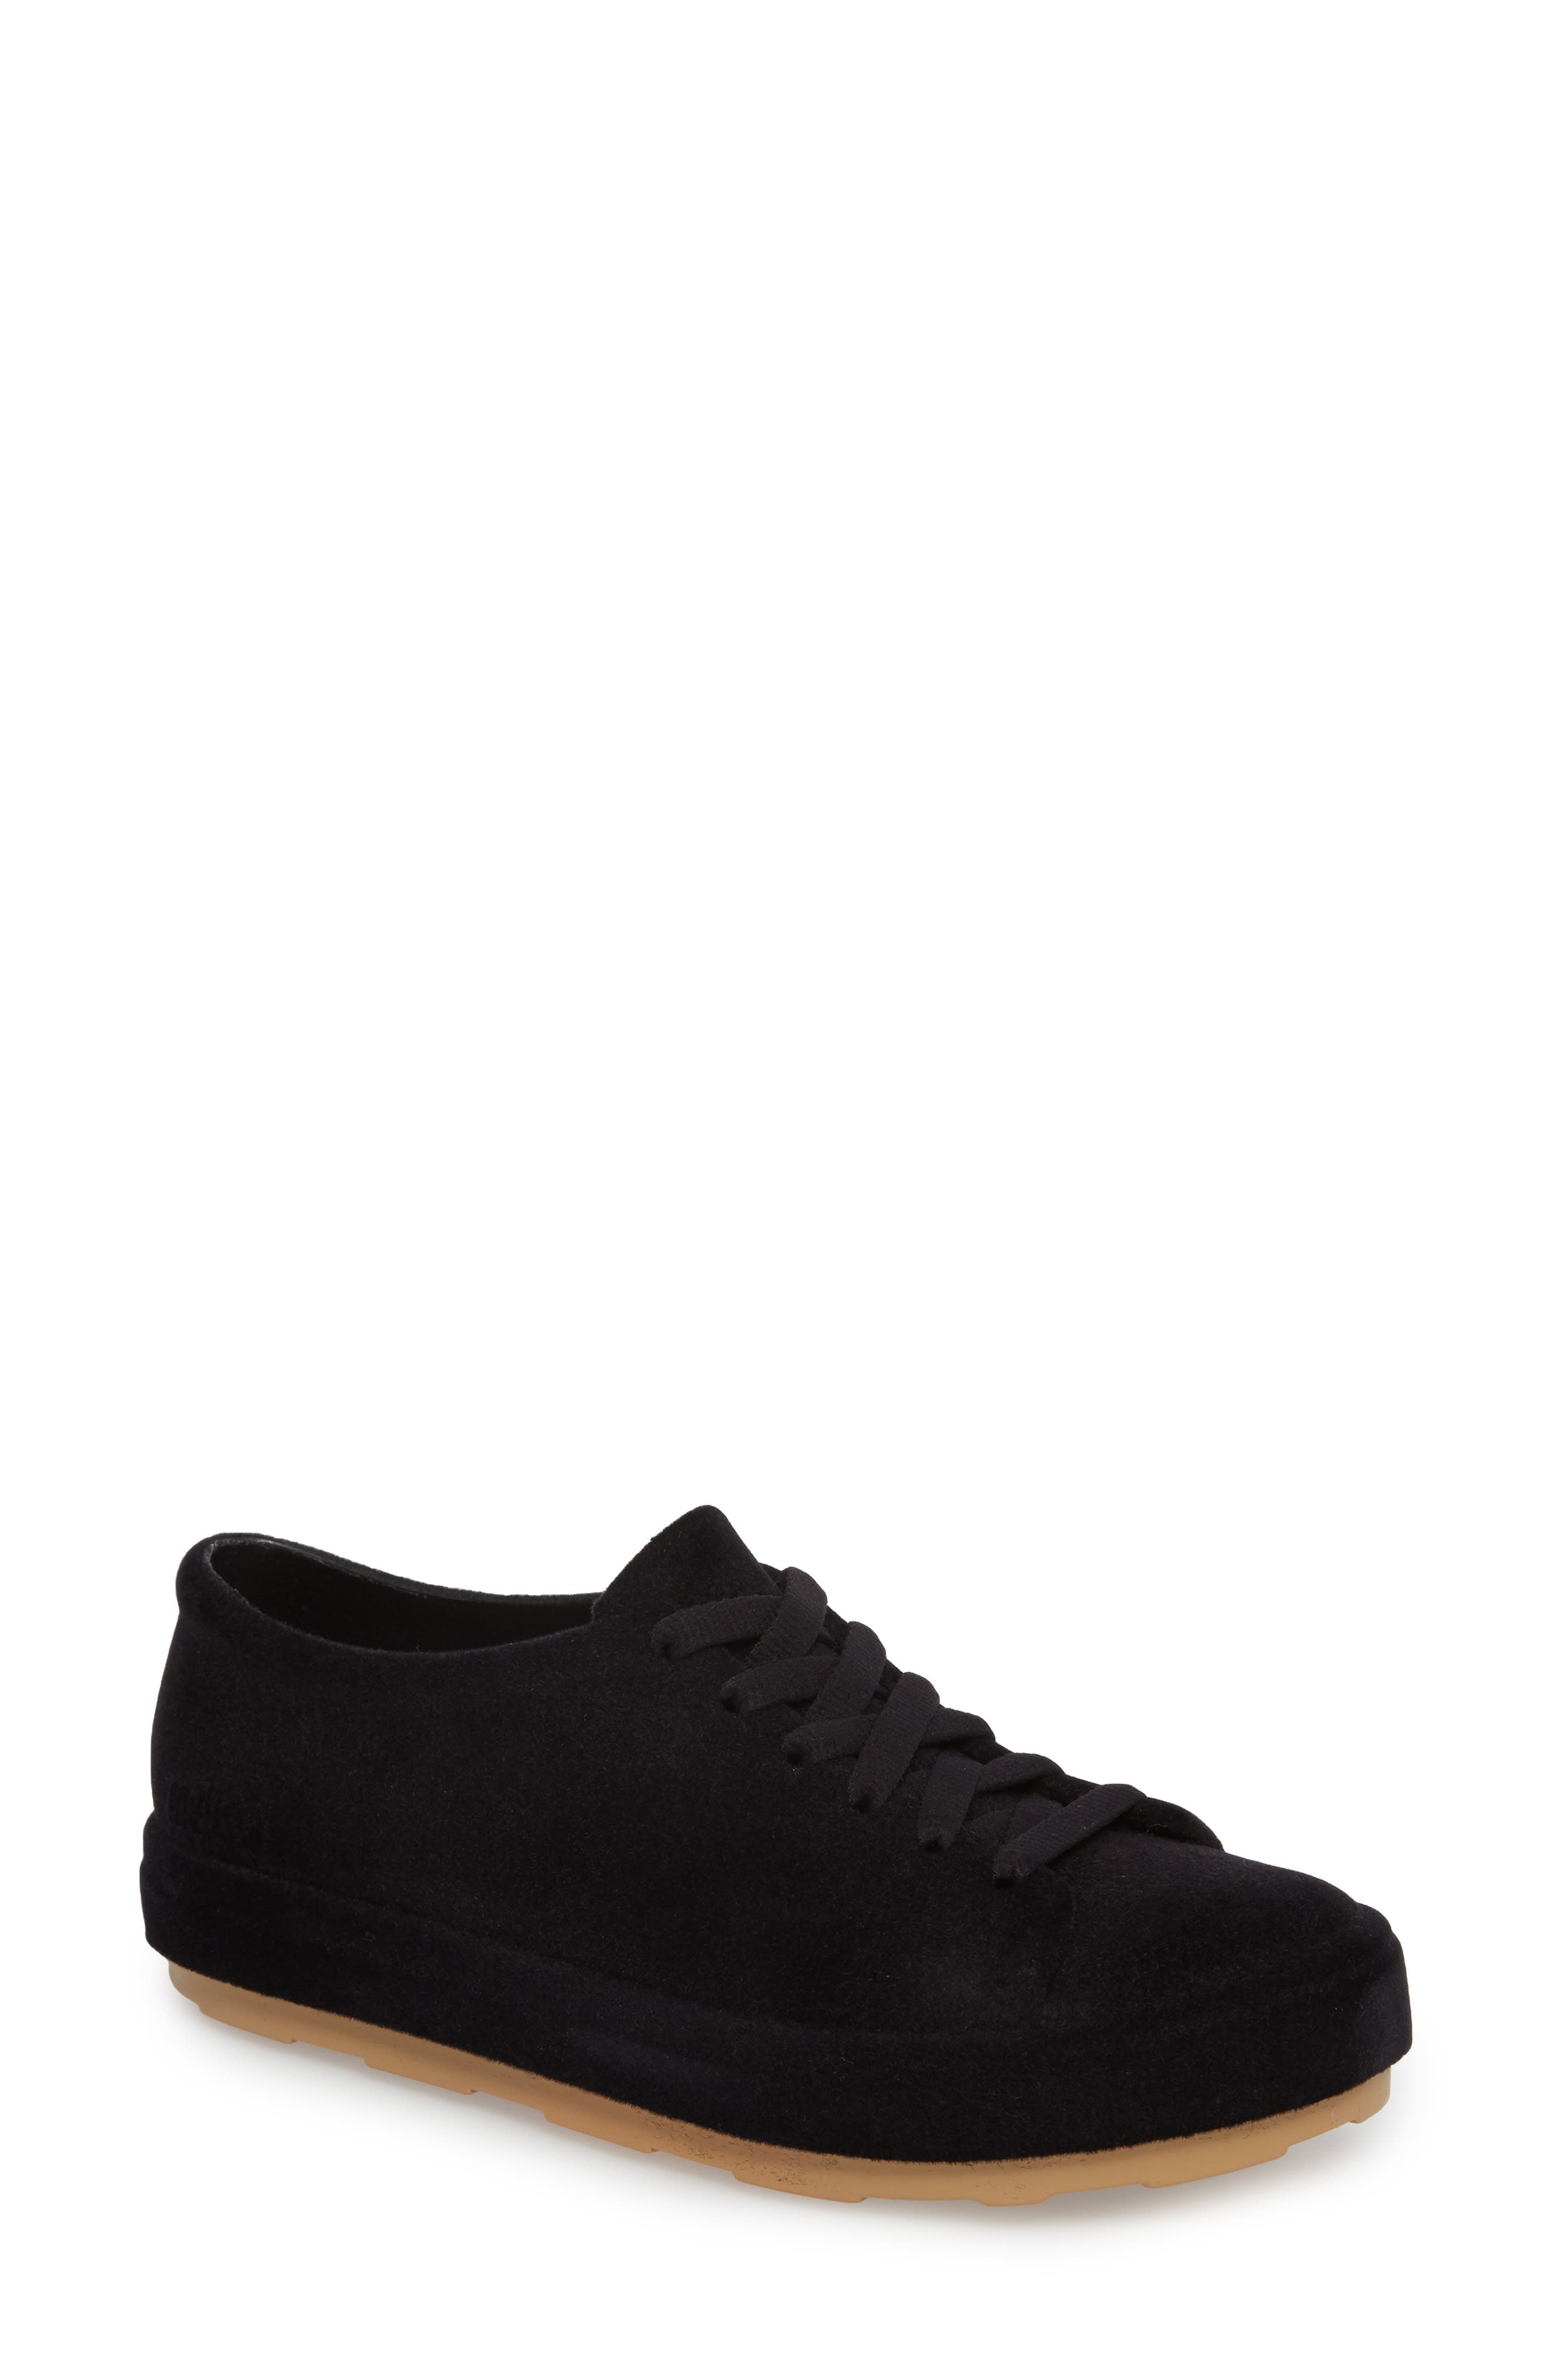 Be Flocked Sneaker,                             Main thumbnail 1, color,                             Black